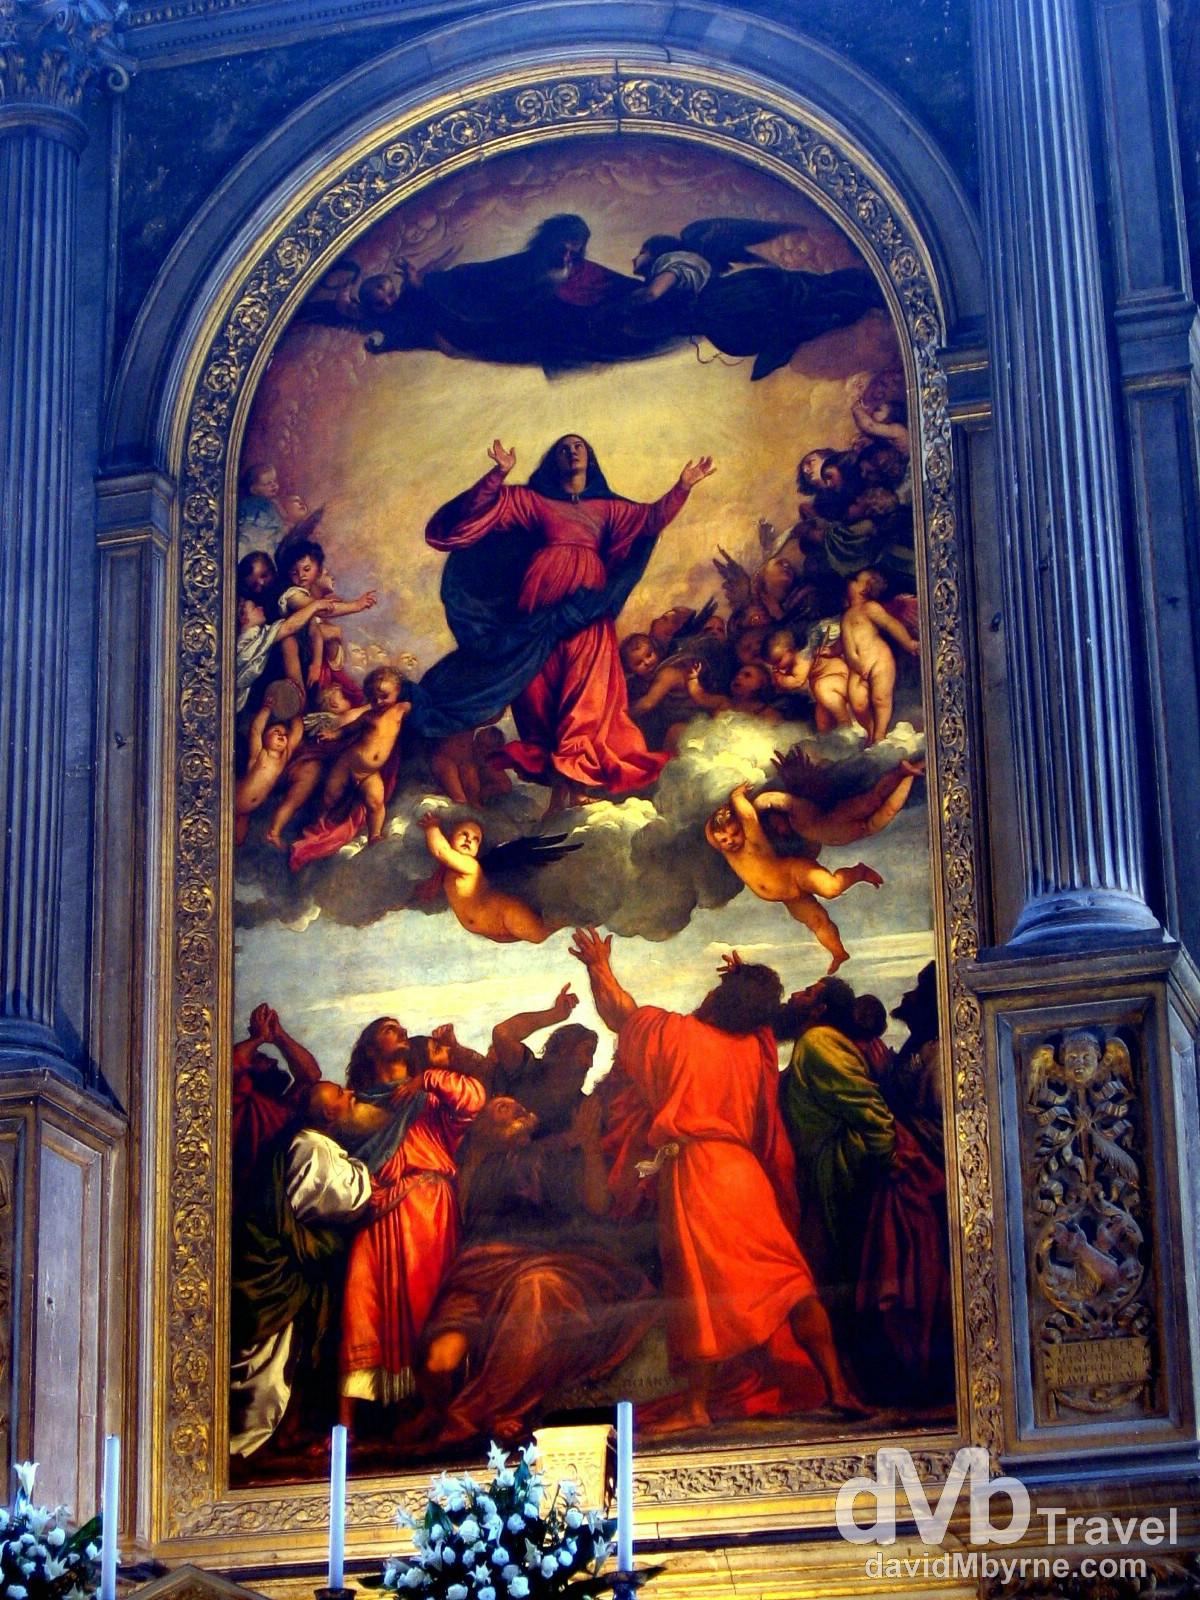 Titian's 1518 The Assumption in Santa Maria Gloriosa dei Frari church, Venice, Veneto, Italy. August 27th, 2007.